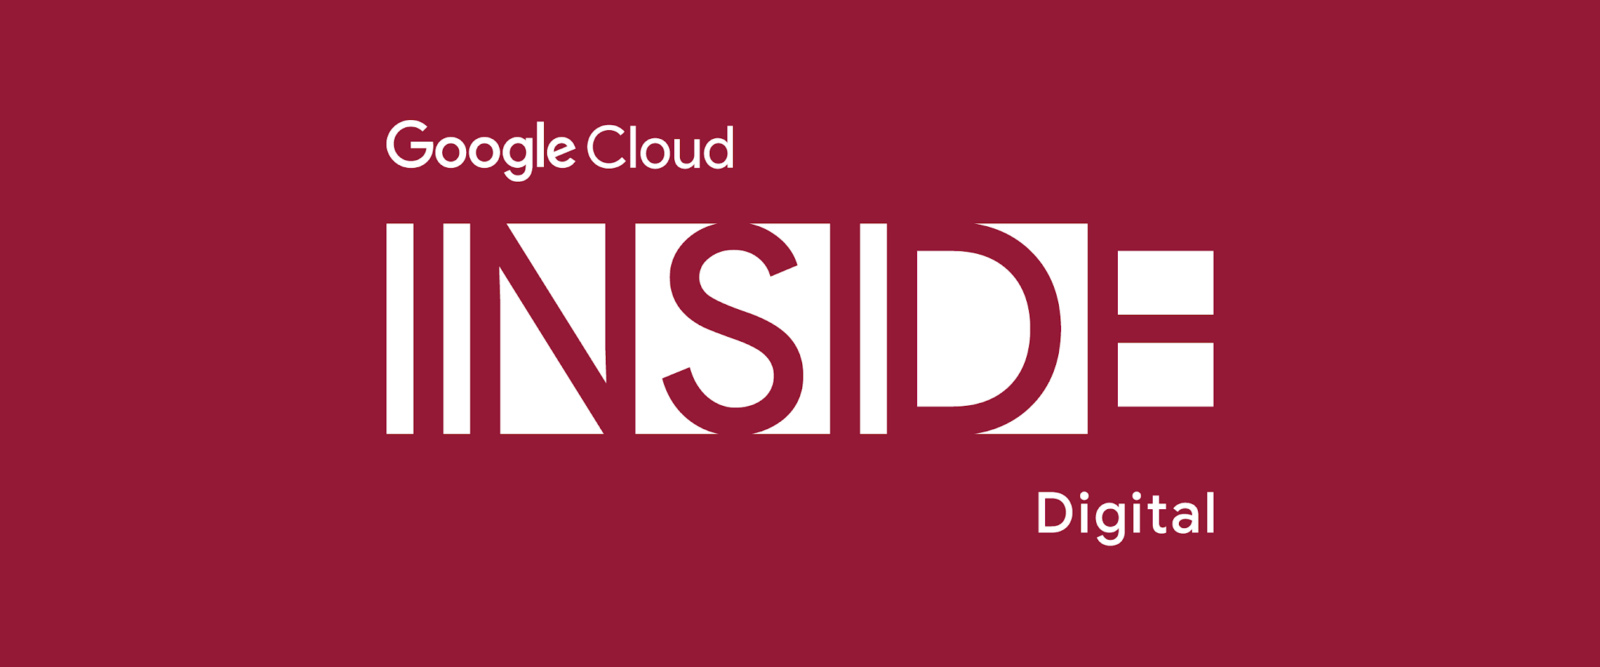 [GCP] Google Cloud Inside Digital Logo